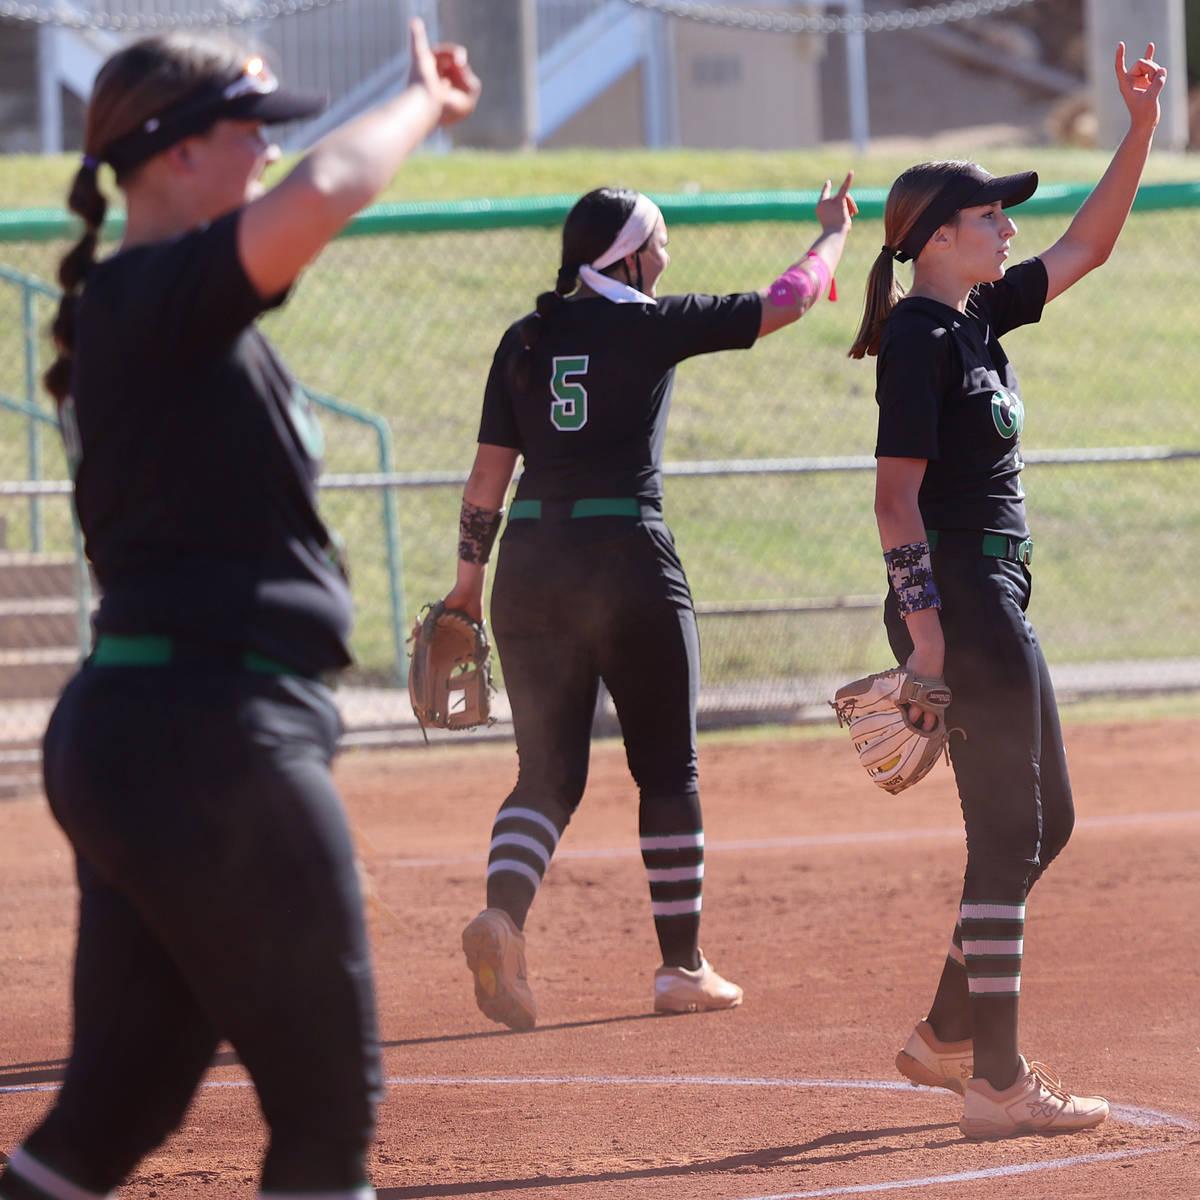 Green Valley's pitcher Avari Morris (1), right, Ava Mearideth (5) and Alicia Ortega (15), gestu ...